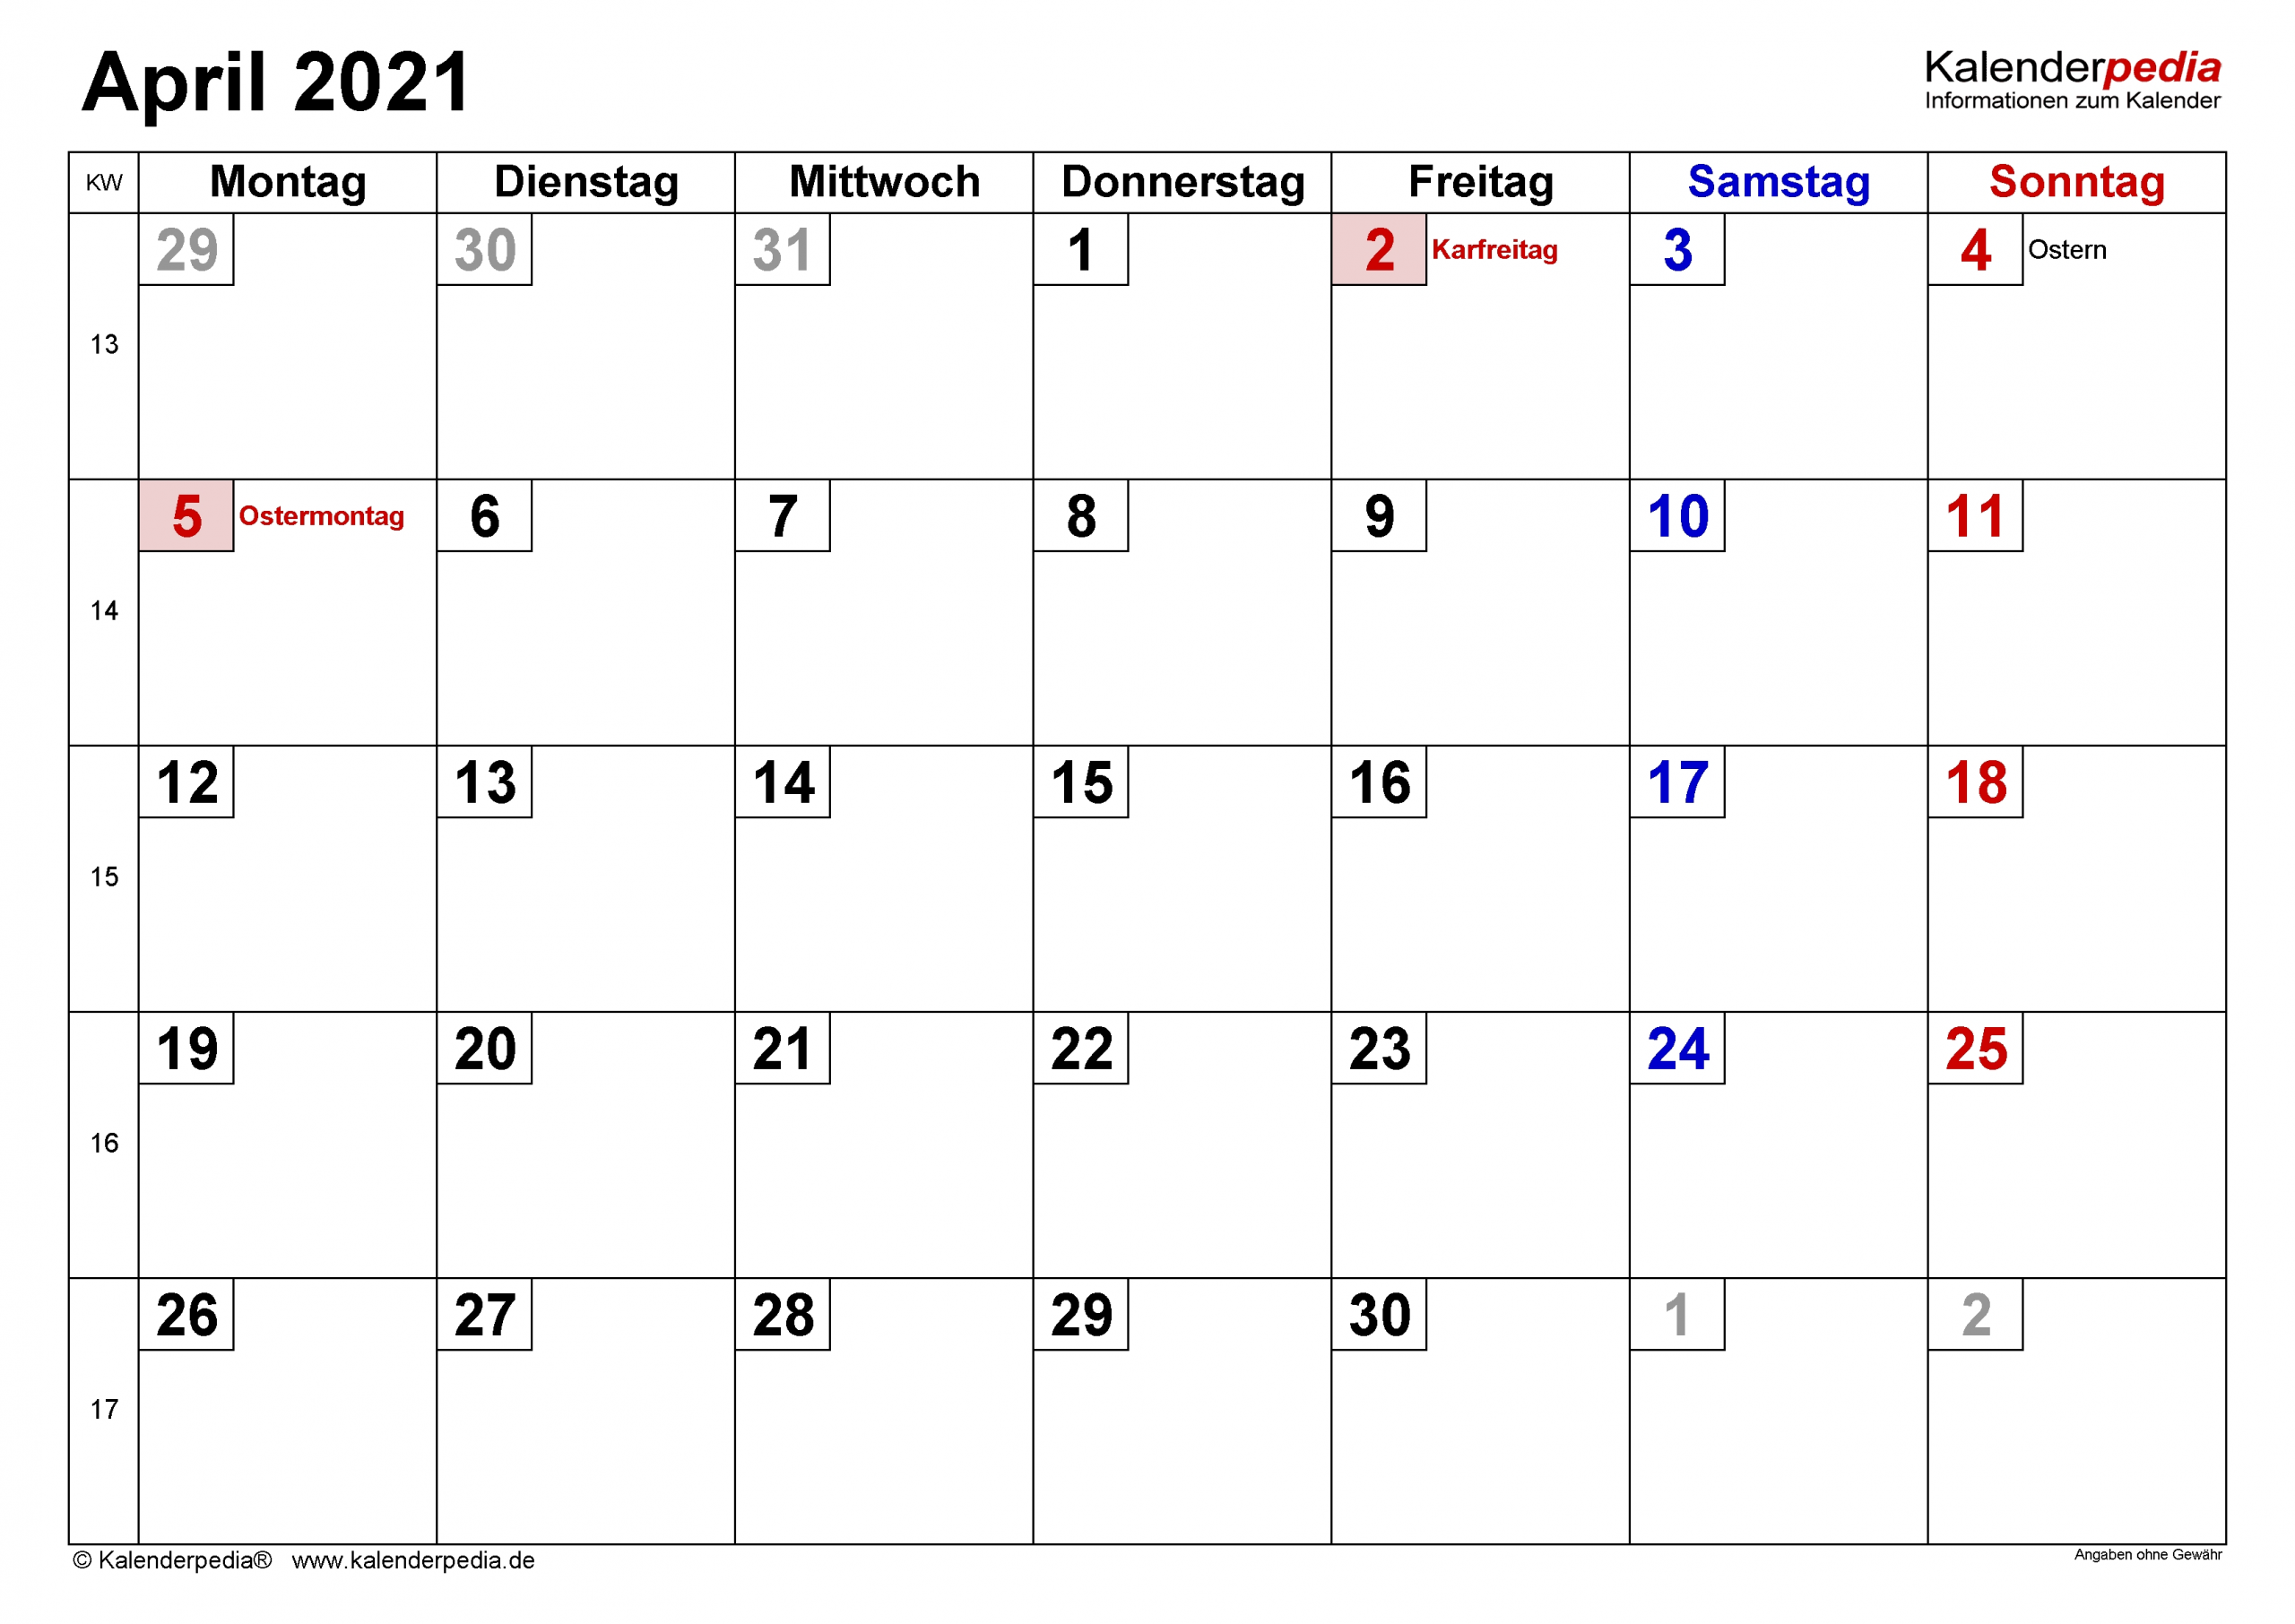 Collect Kalenderblatt Monat 2021